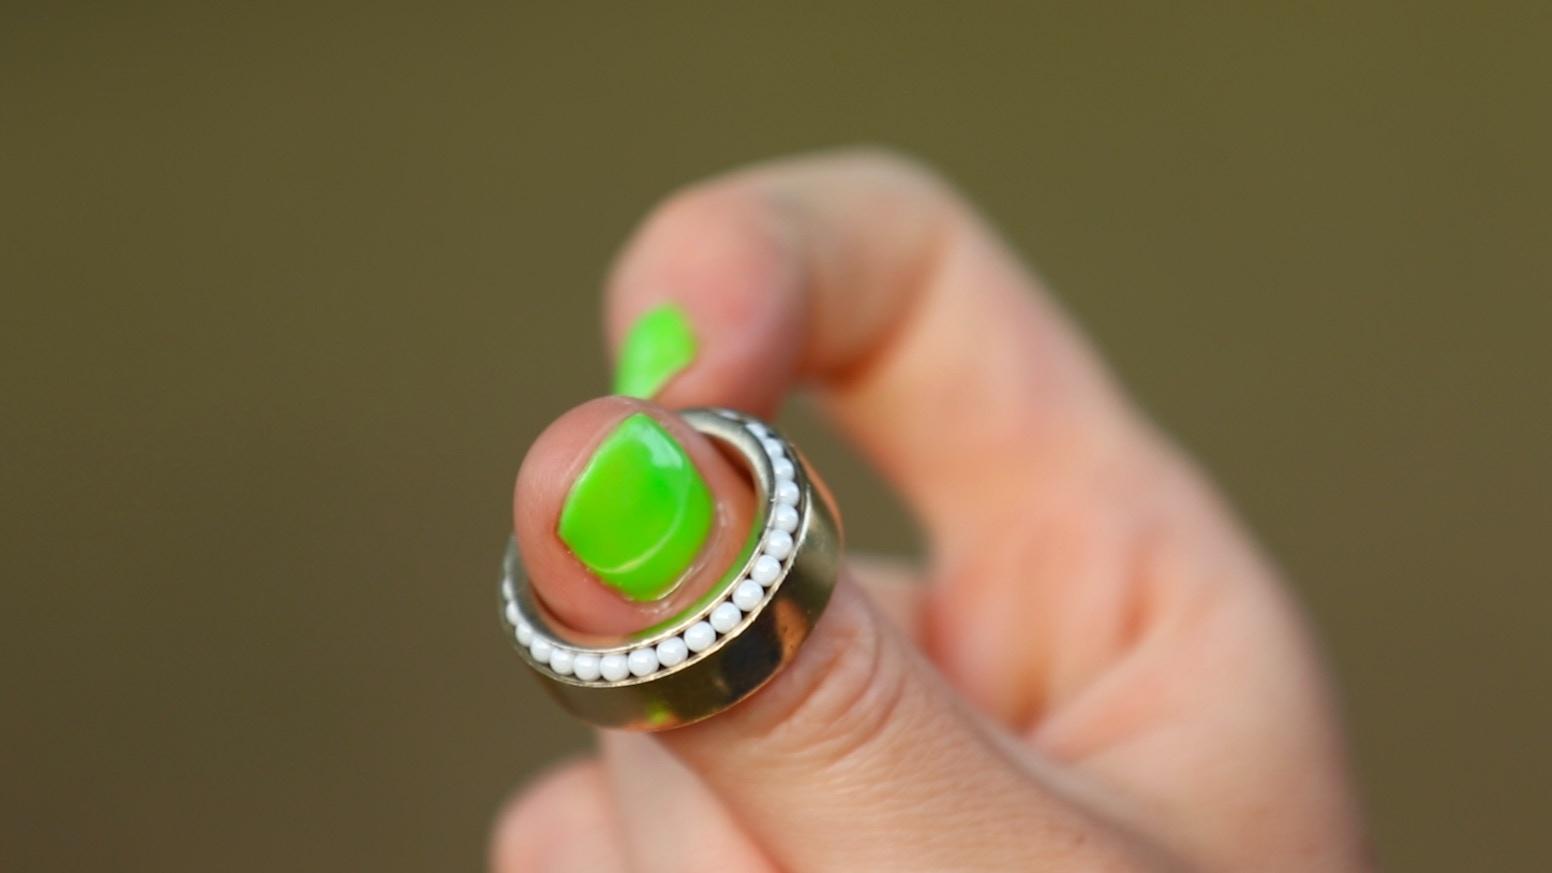 Vinci Ring - Discreet and Elegant Fidget Spinner by Hadley Graham ...